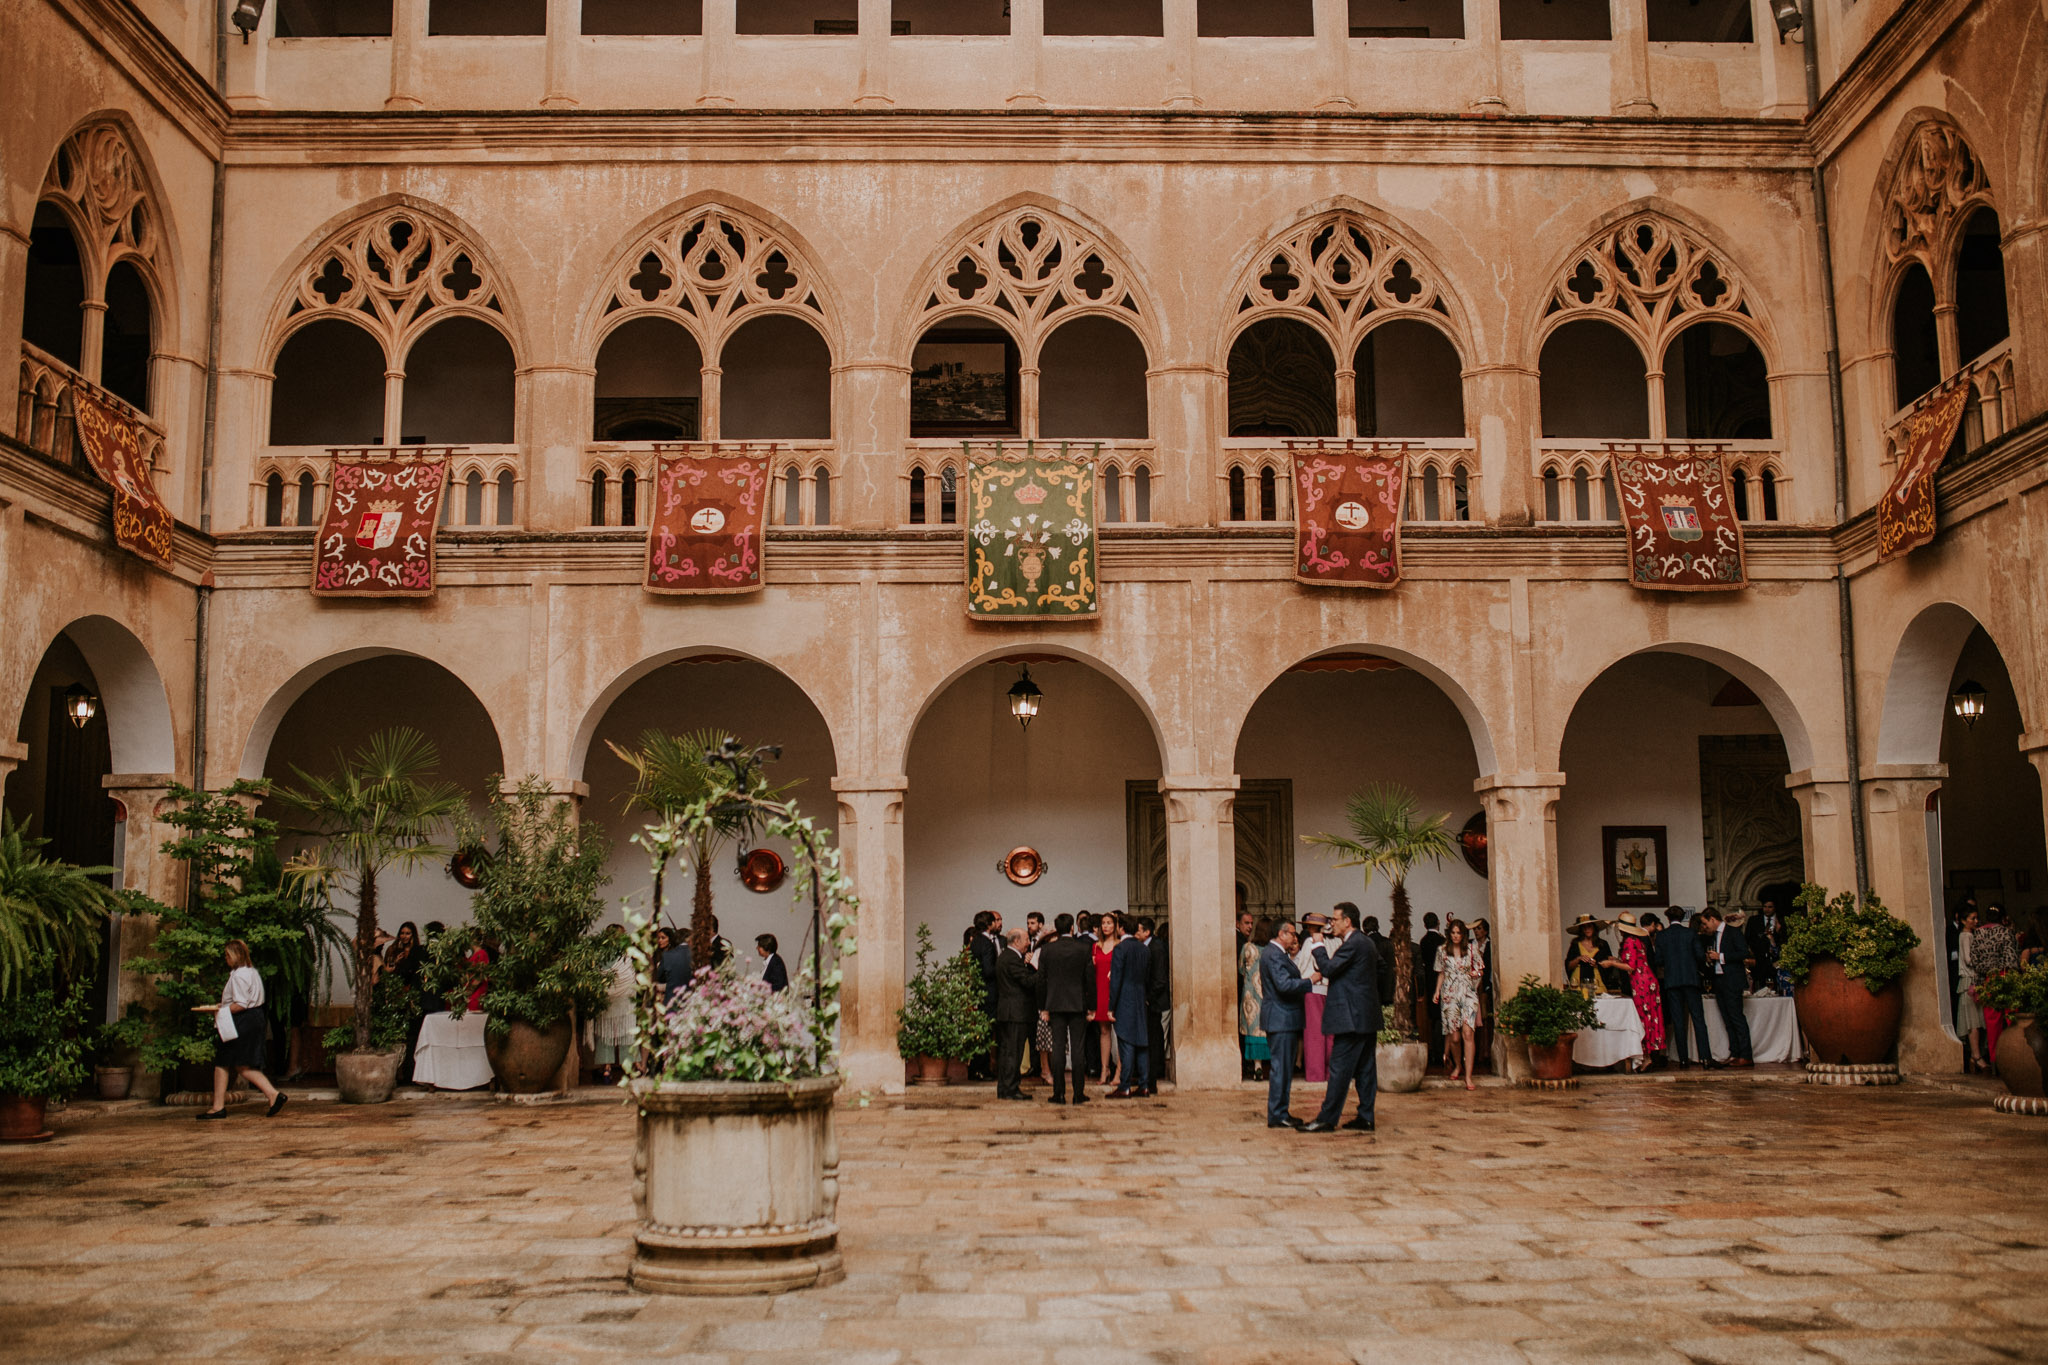 fotografia-boda-wedding-photographer-spain-concorazon-179